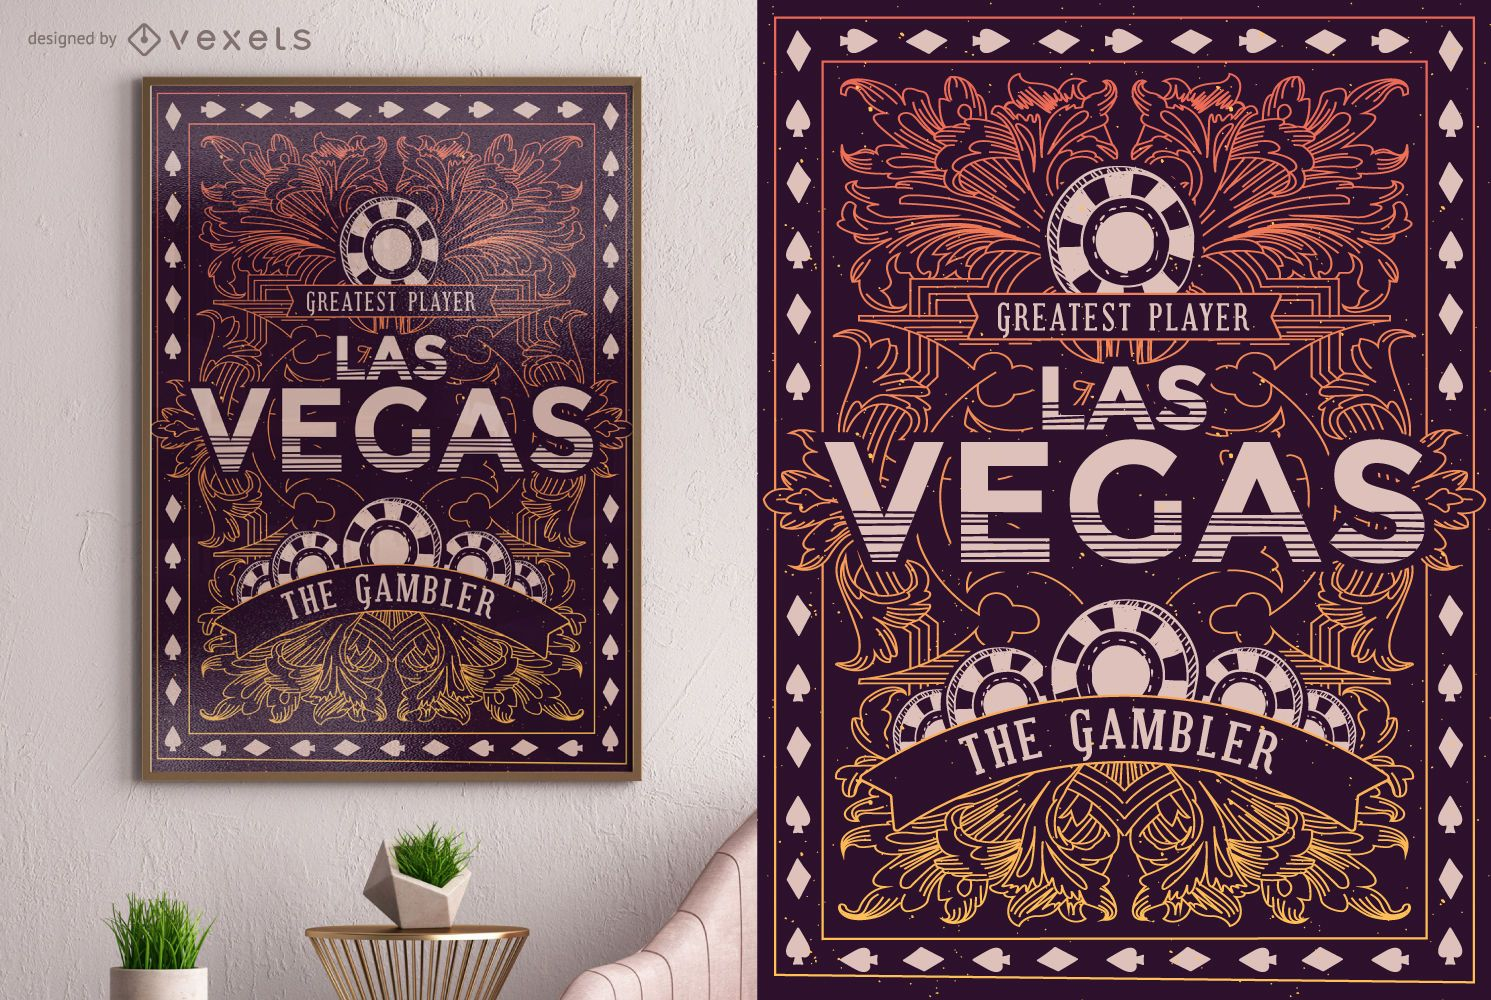 Dise?o de cartel de jugador de Las Vegas